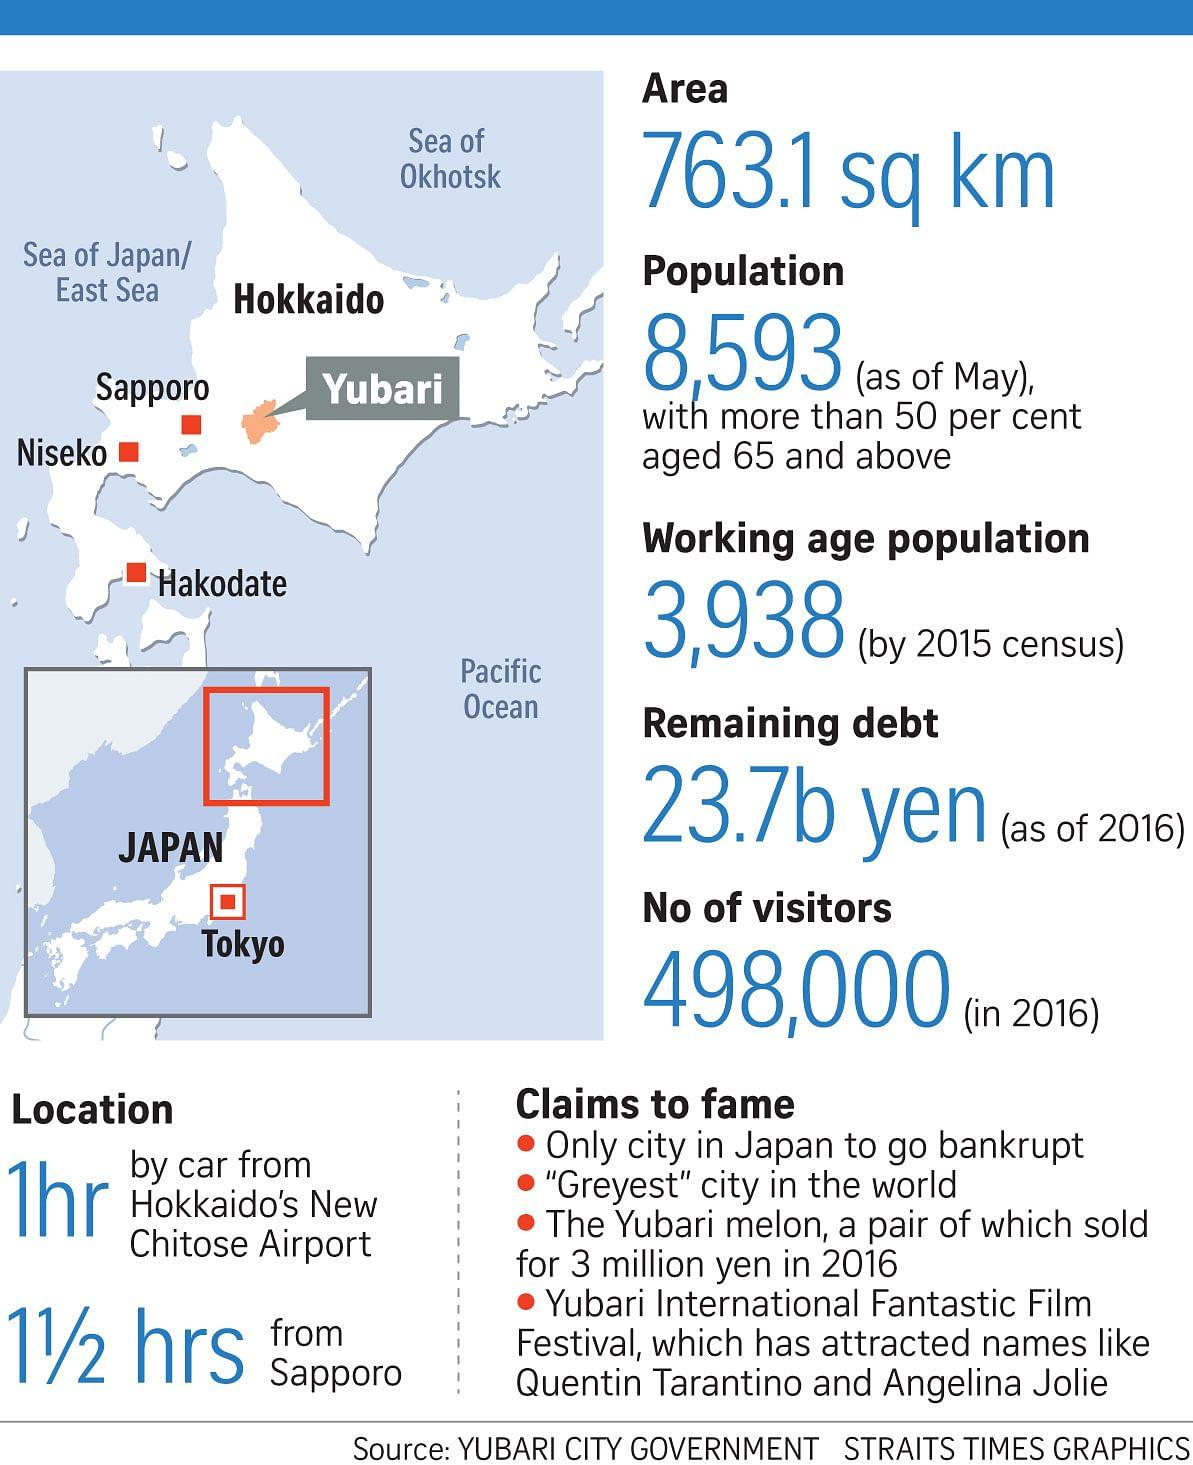 Yubari - Japan's 'greyest' city - fights depopulation